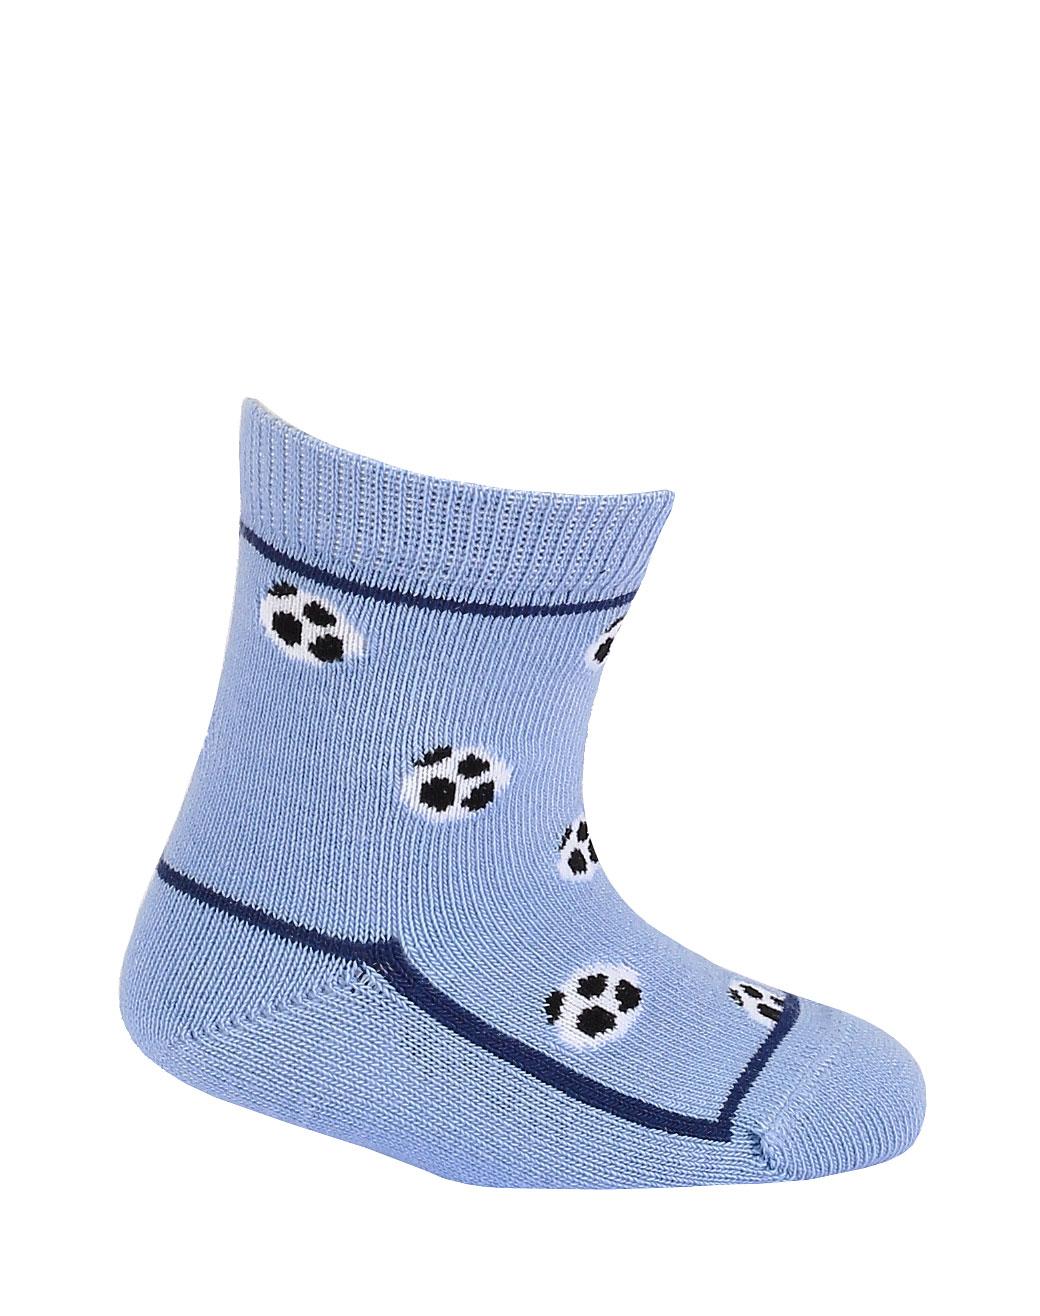 kojenecké ponožky vzor WOLA MÍČKY 15-17